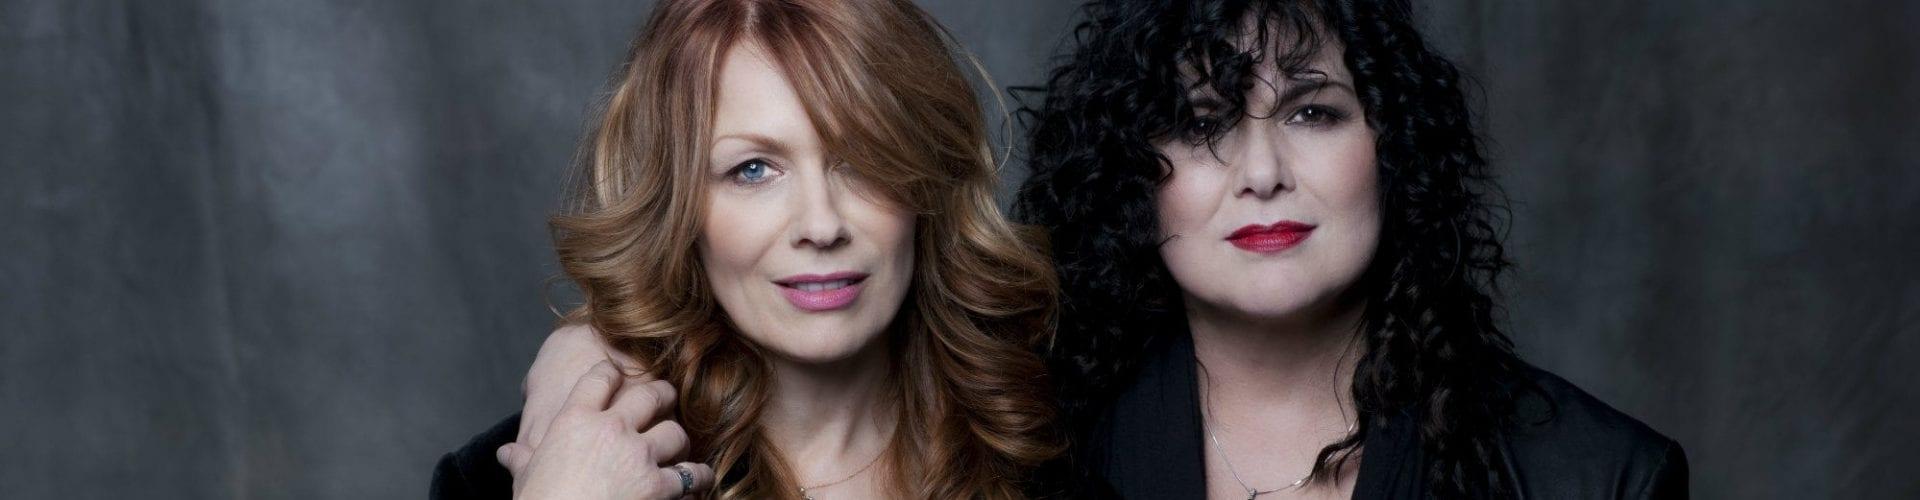 Heart's 'Love Alive Tour' To Feature Joan Jett, Brandi Carlile, Sheryl Crow